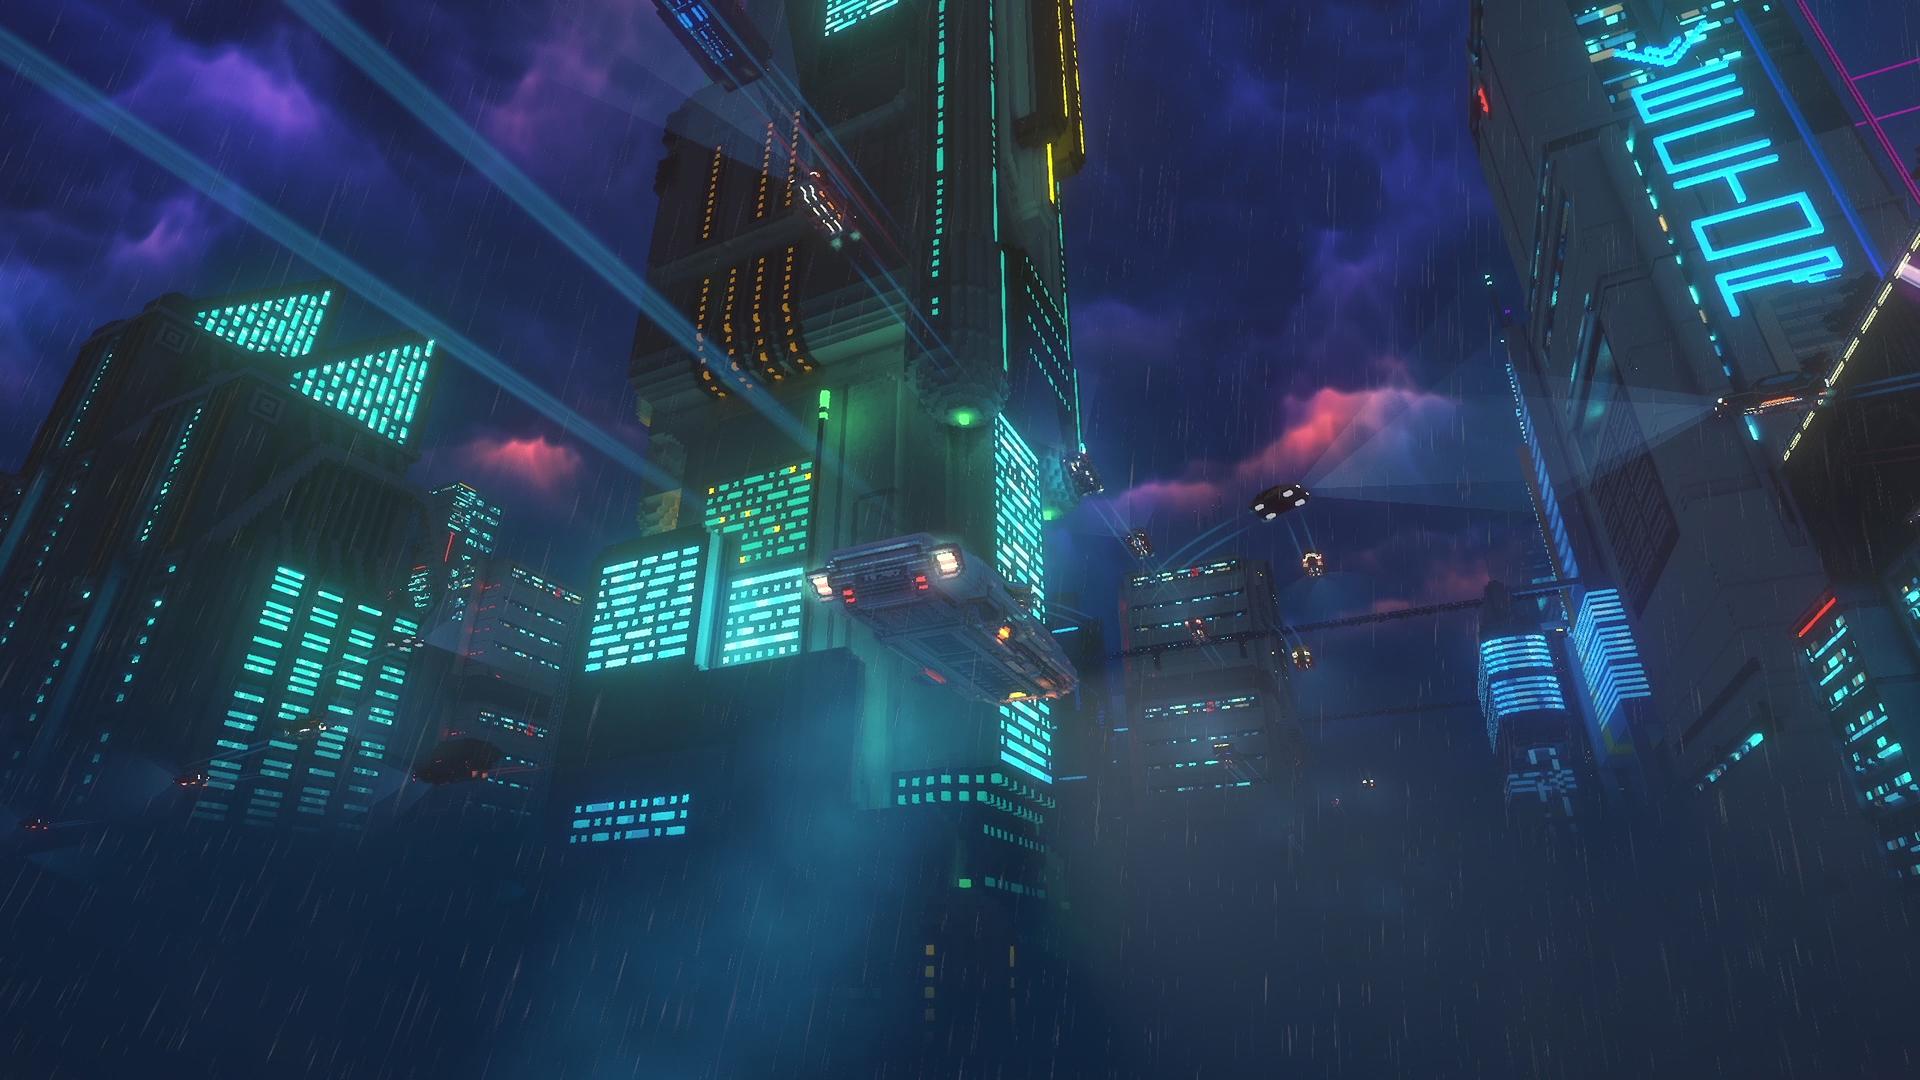 cloudpunk DLC